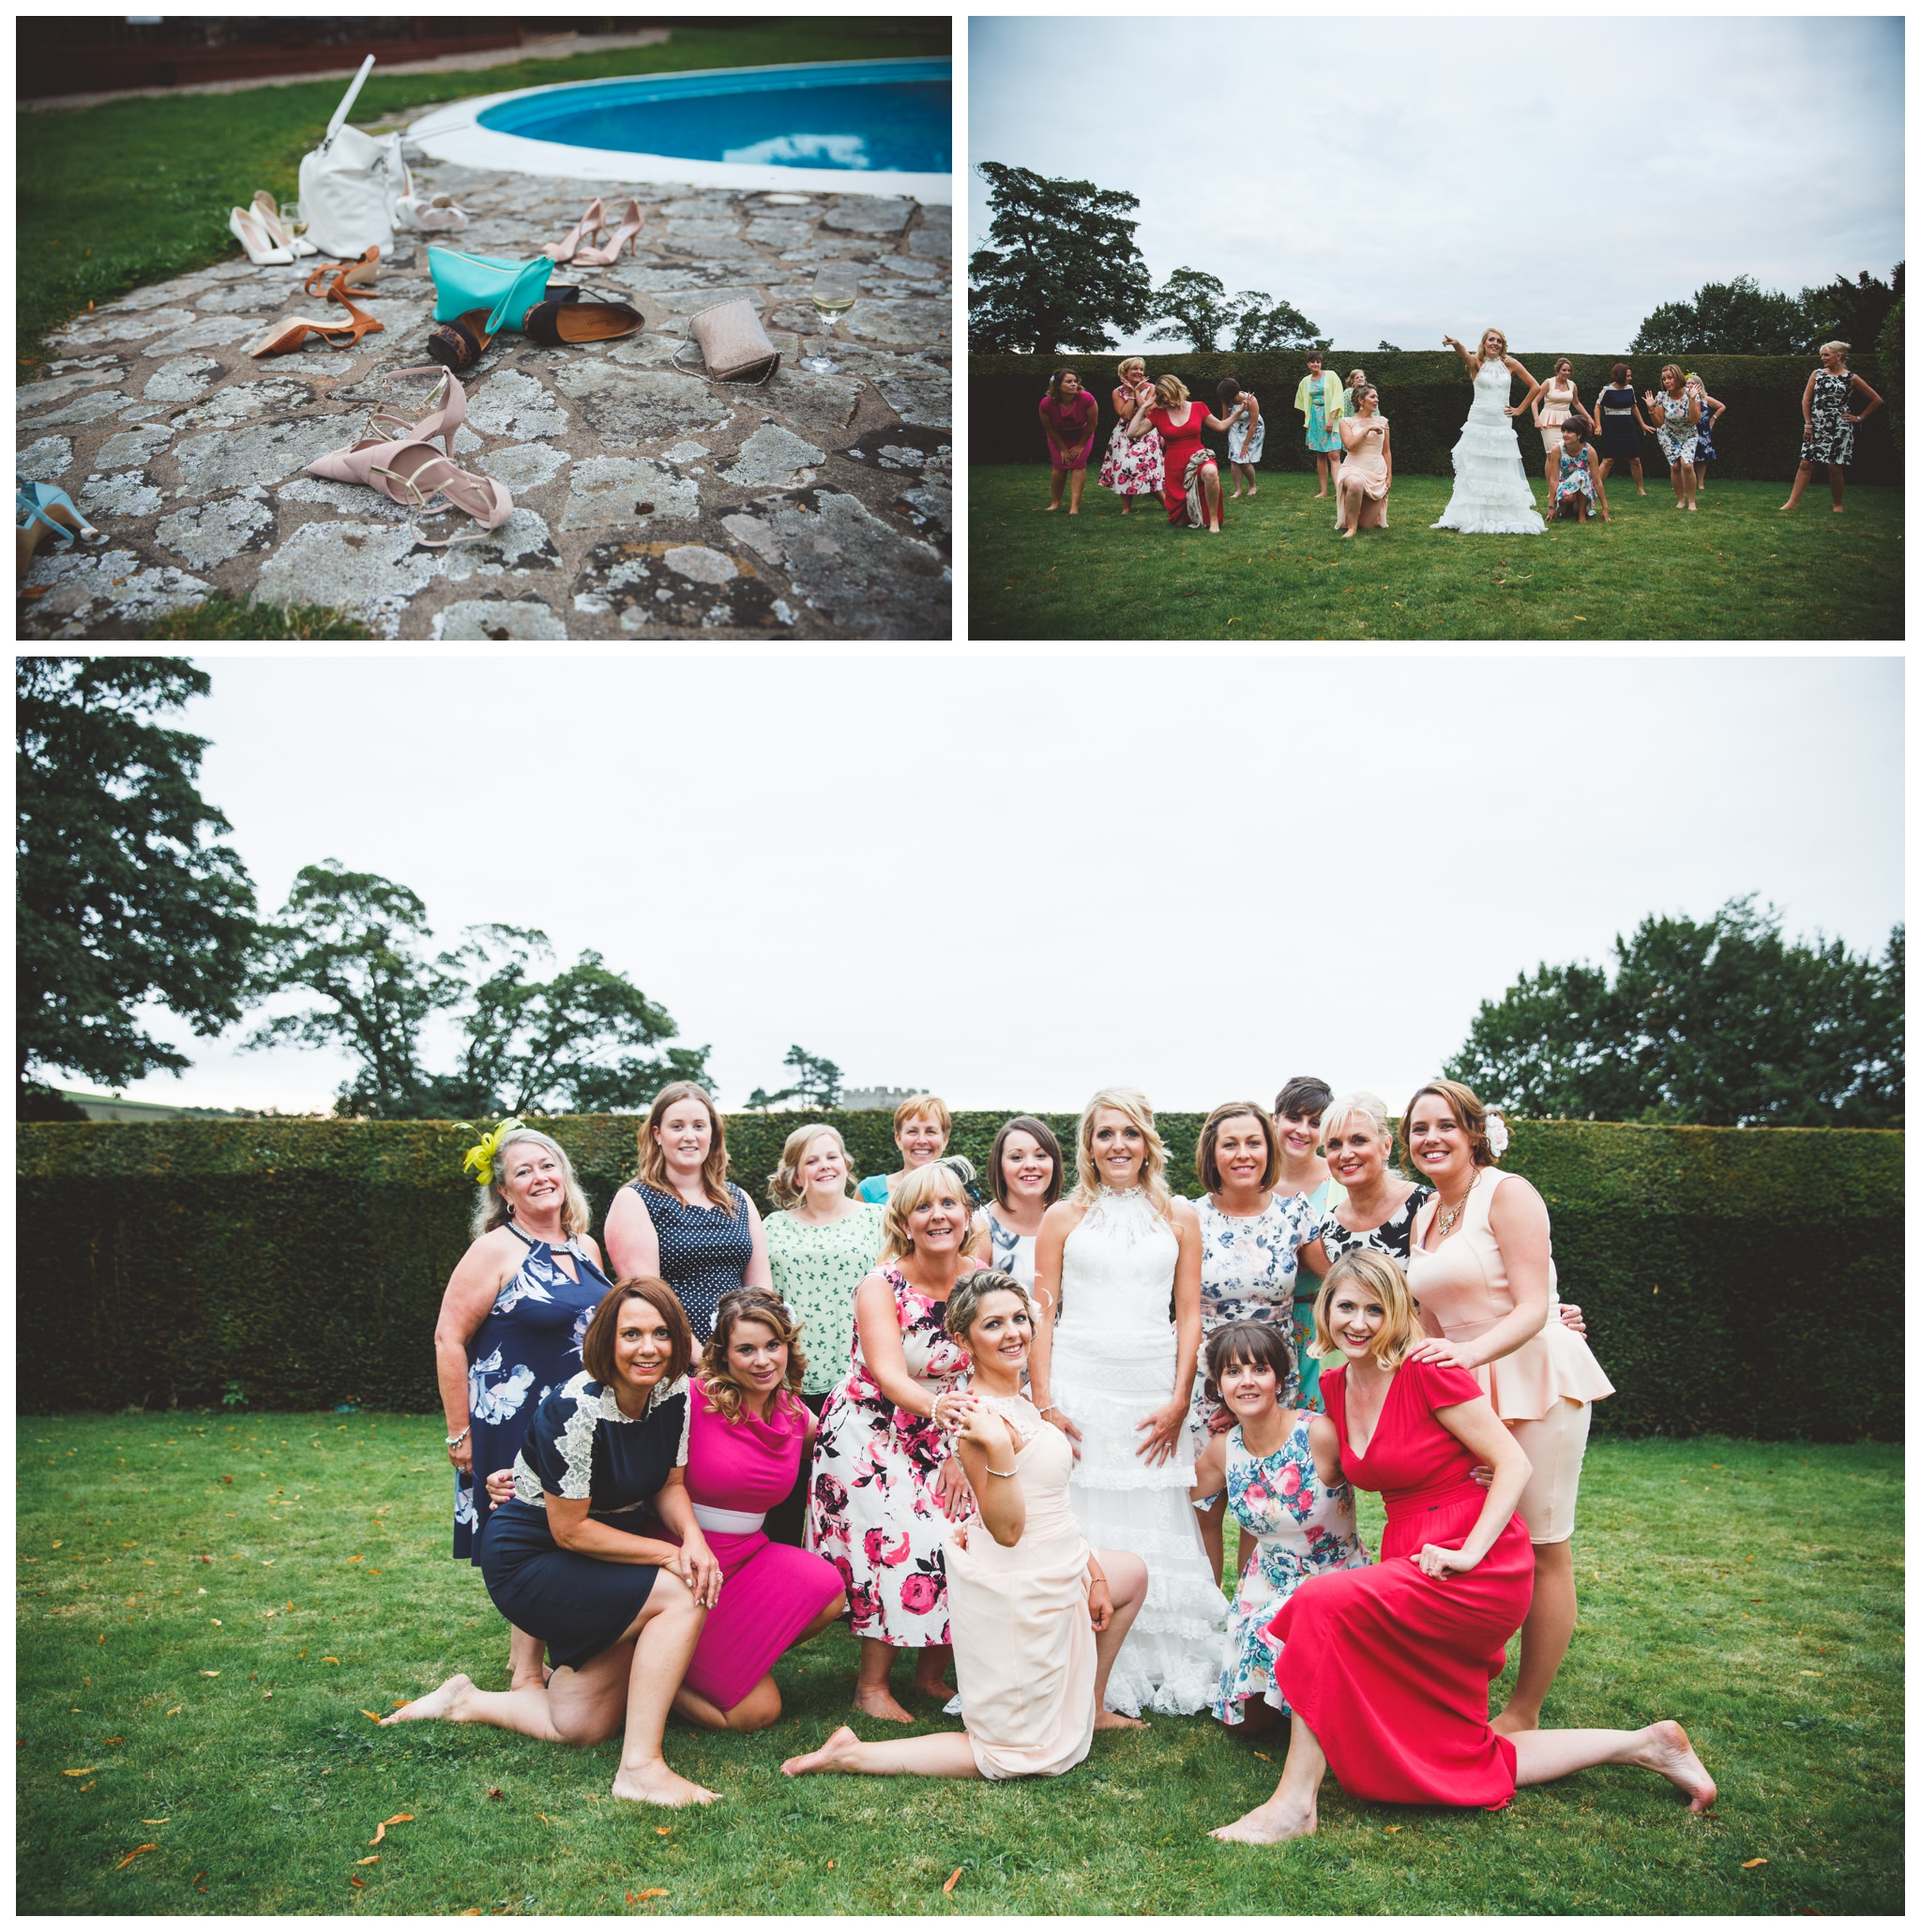 Richard Savage Photography - Wedding - Peterstone Court Brecon - 2016-05-11_0059